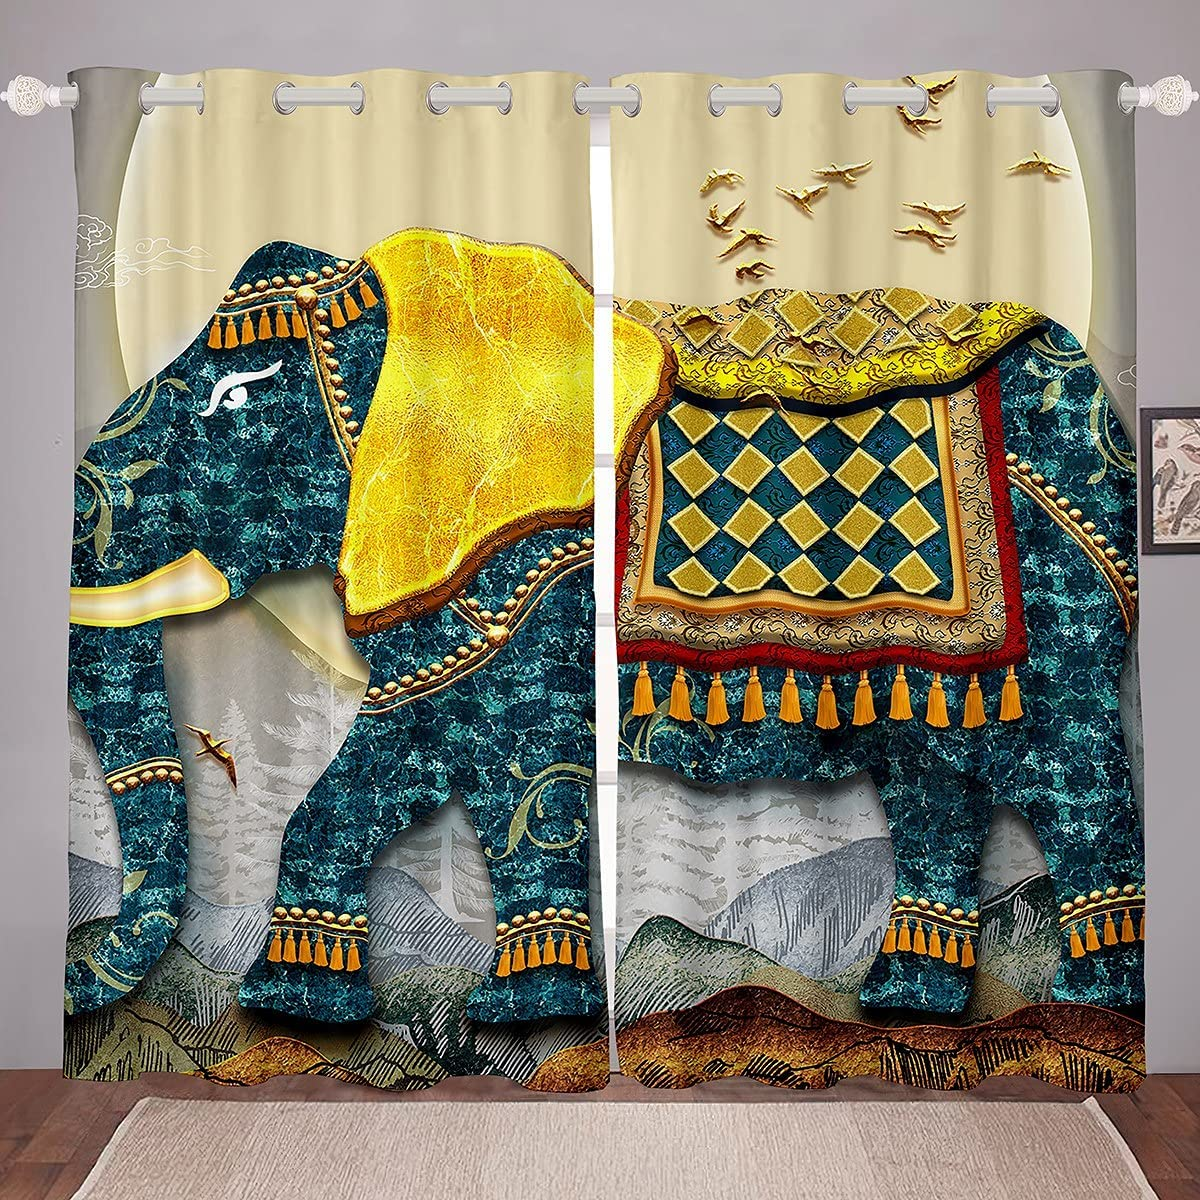 2021 model Dedication Castle Fairy Elephant Window Drapes Gorgeous Print Room Animal D